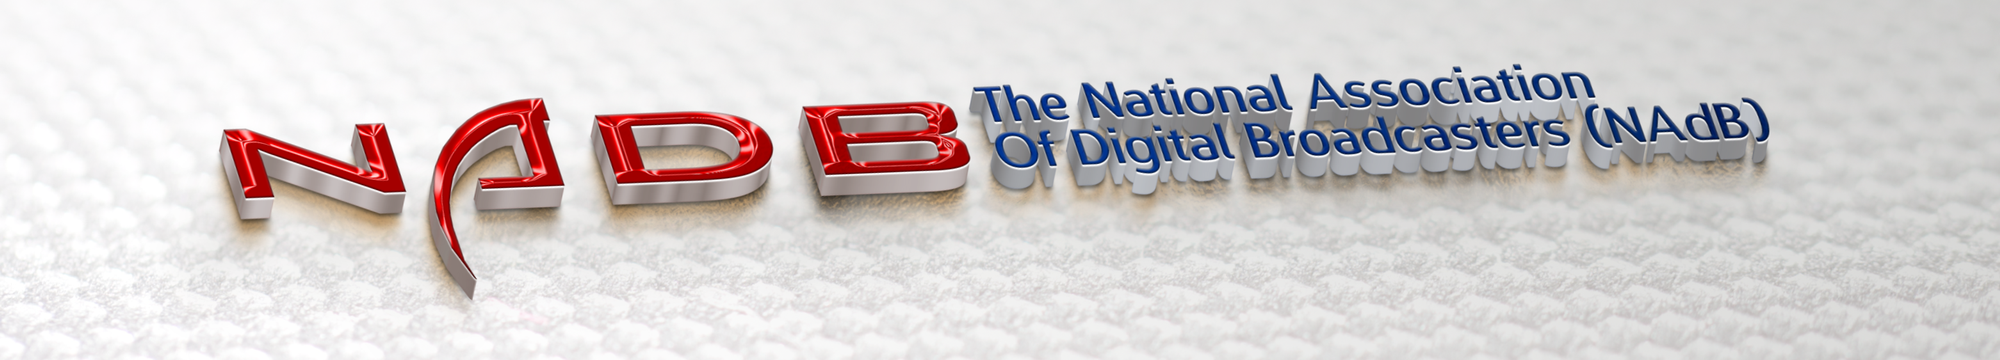 National Association of Digital Broadcasters Logo